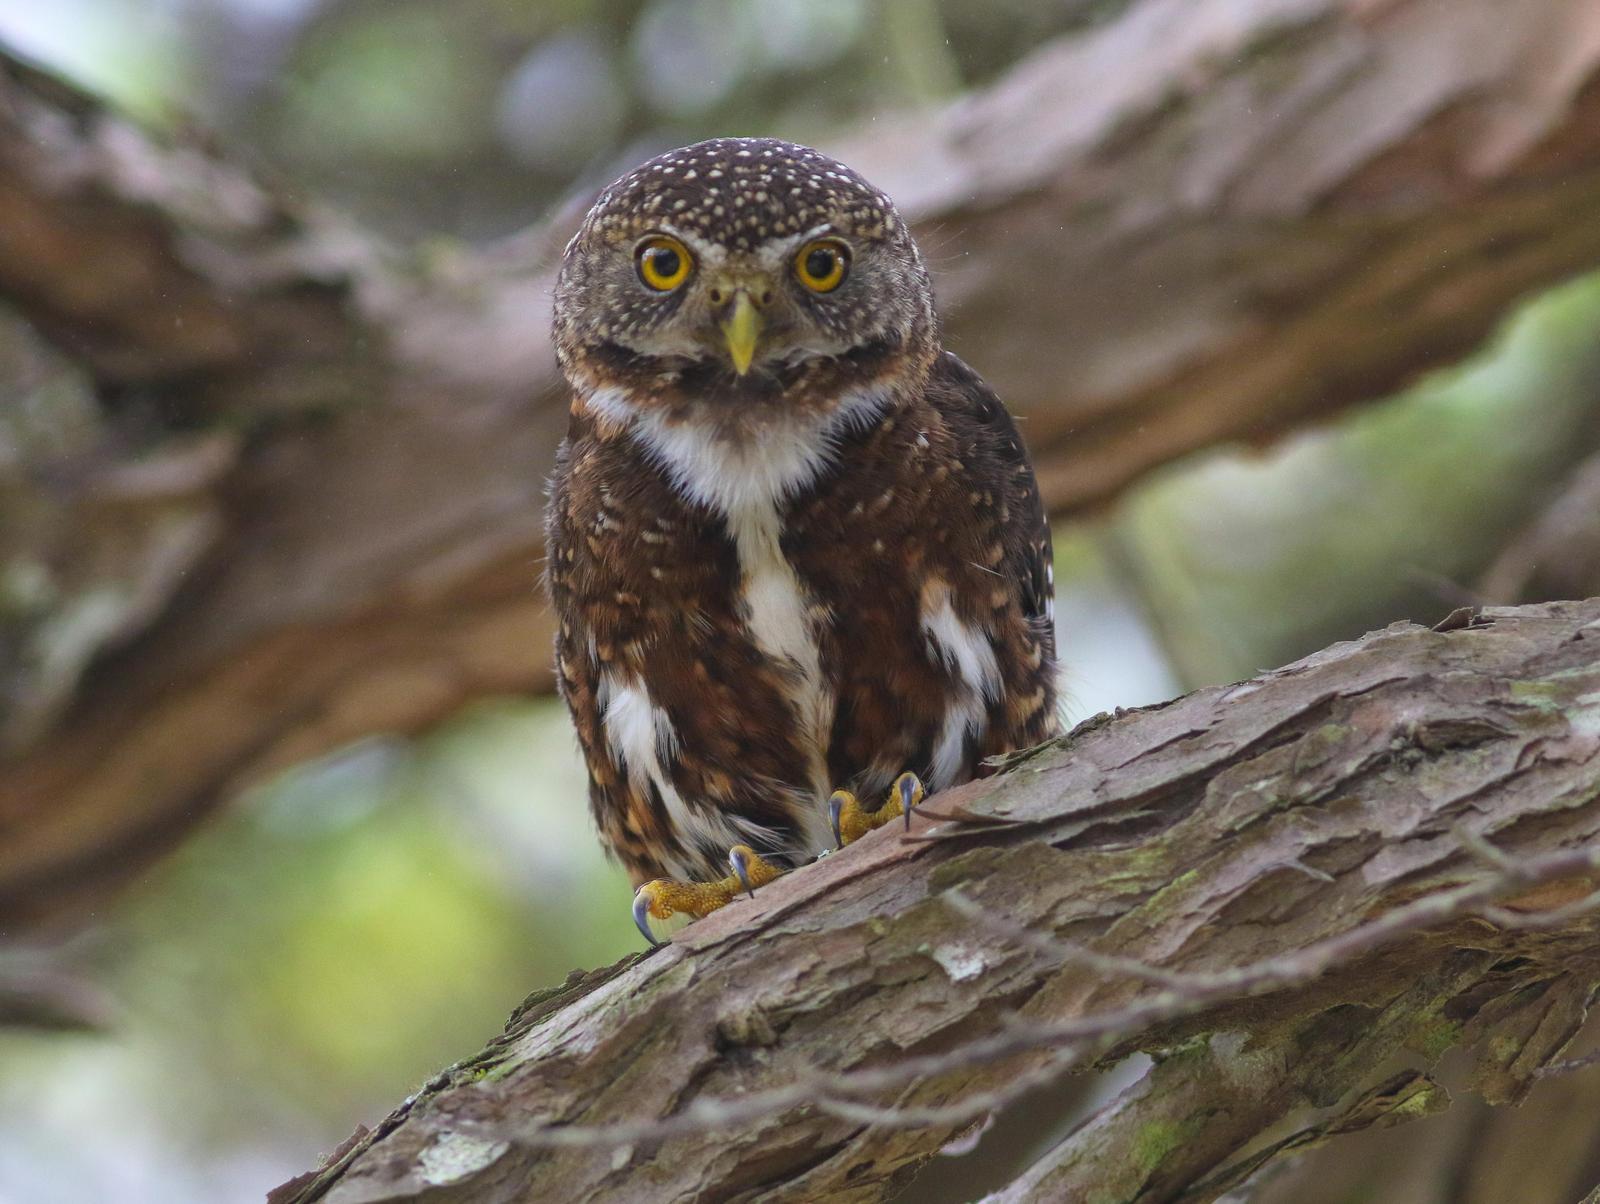 Costa Rican Pygmy-Owl Photo by Leonardo Garrigues